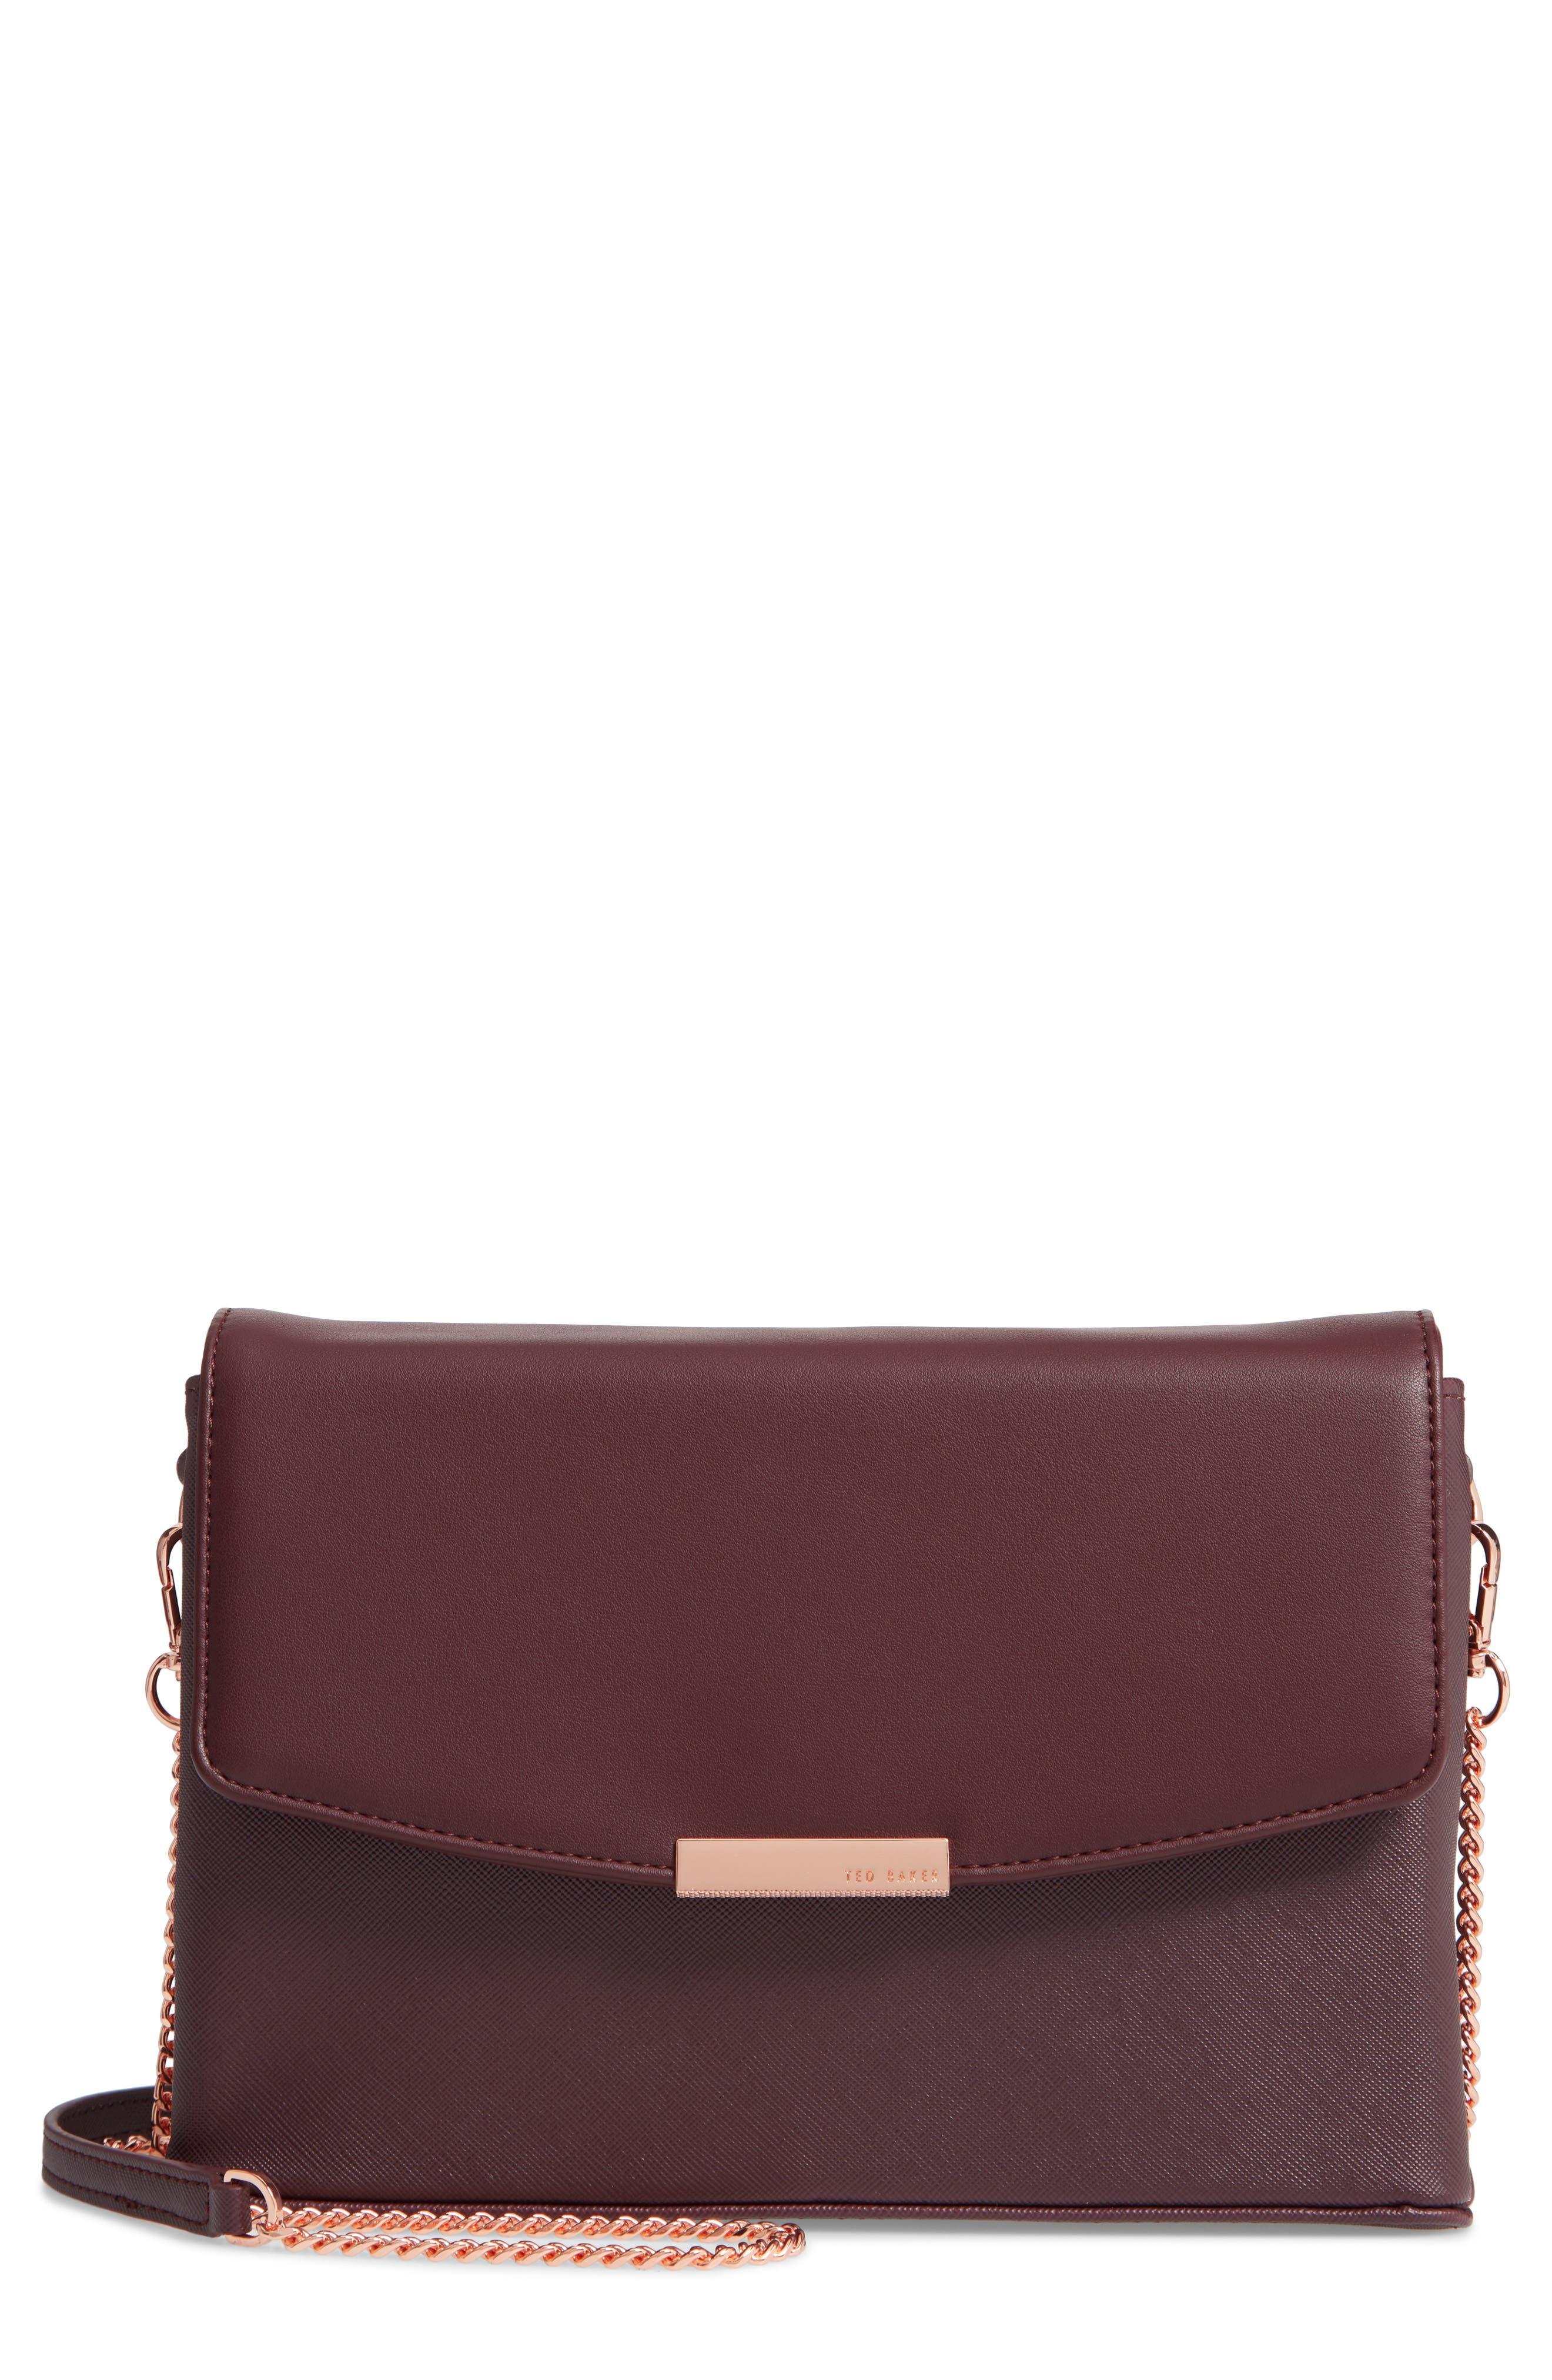 Faux Leather Crossbody Bag,                         Main,                         color, DEEP PURPLE